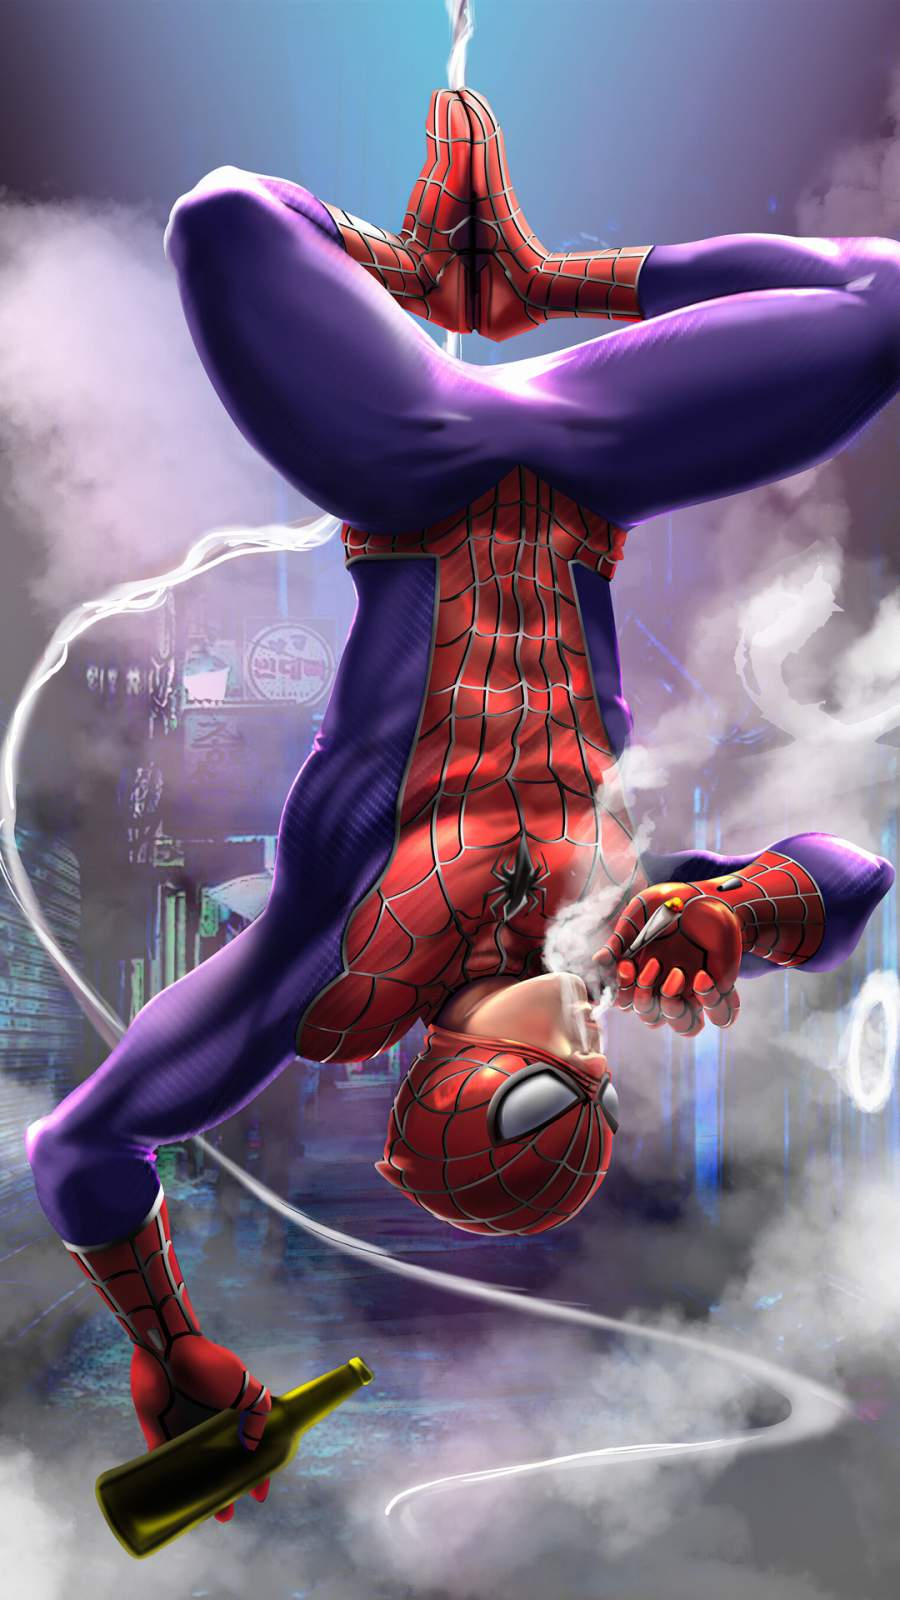 Spiderman Smoker iPhone Wallpaper